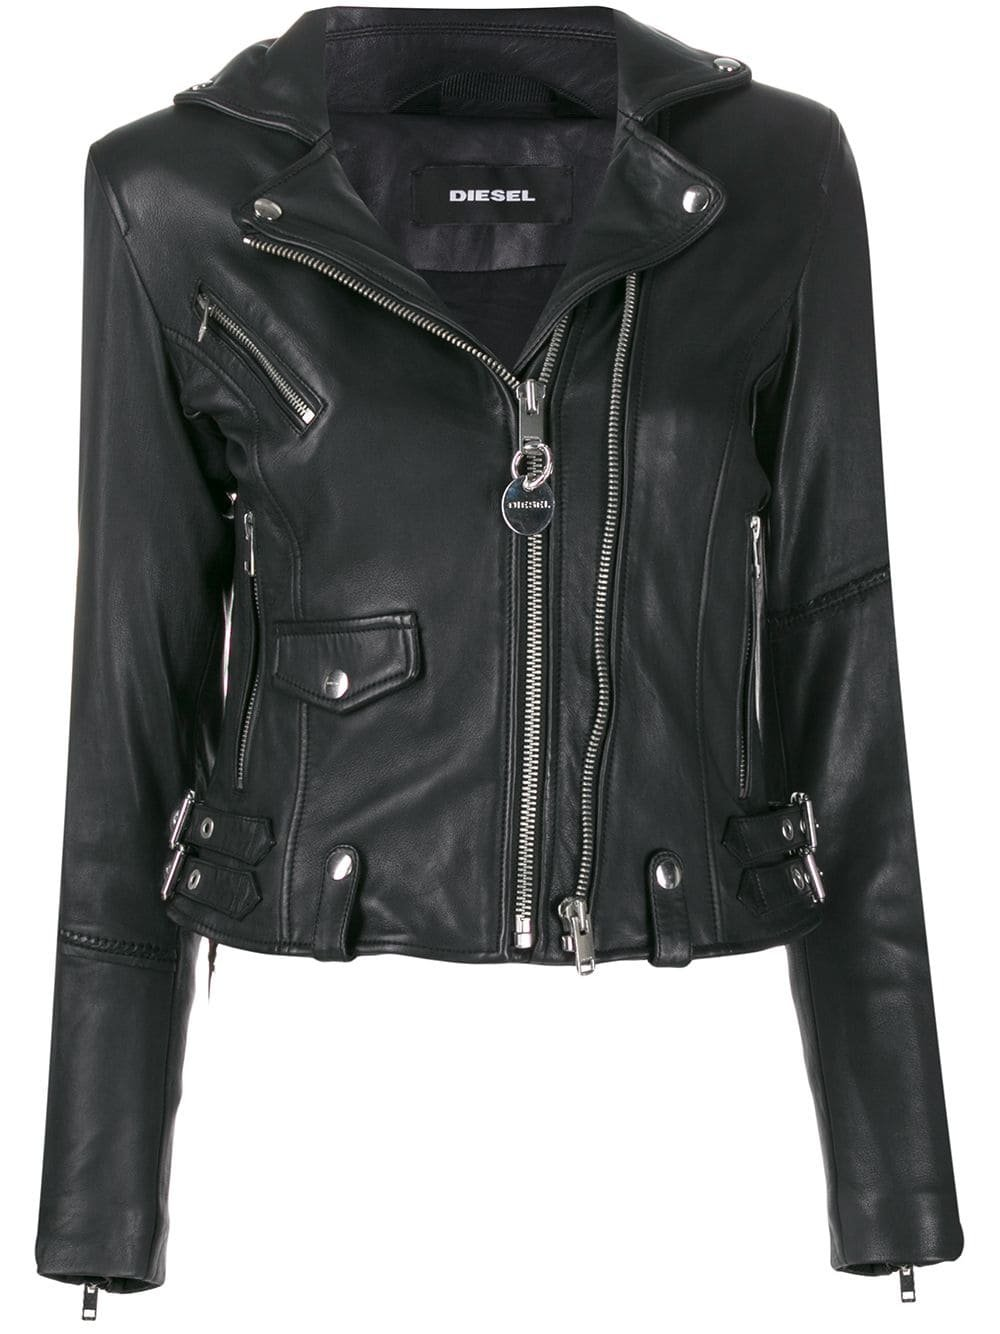 Diesel studded biker jacket £590 - Fast Global Shipping, Free Returns